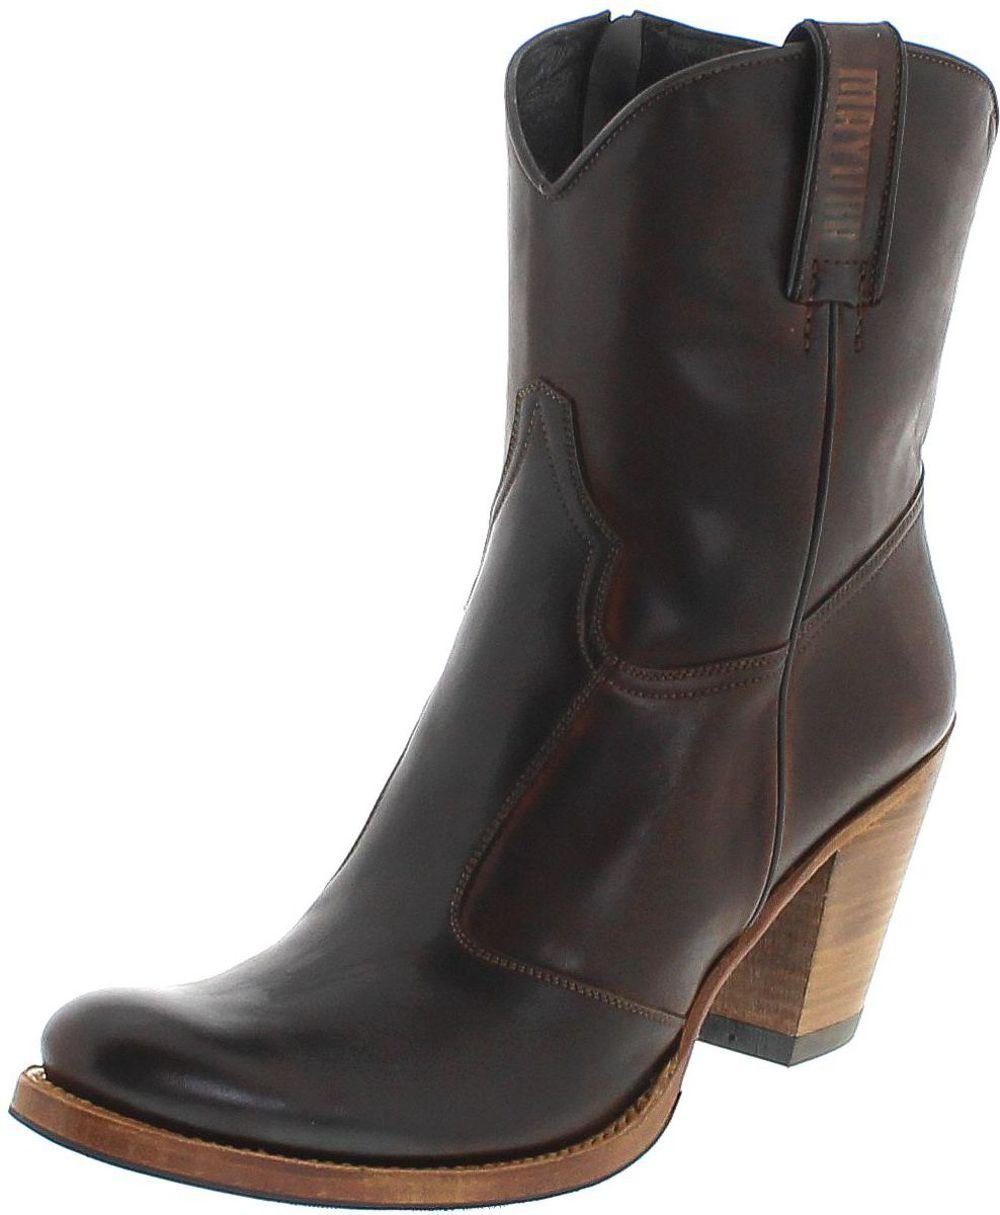 Mayura Boots MB028 Lavado Tierra Fashion Stiefelette - braun